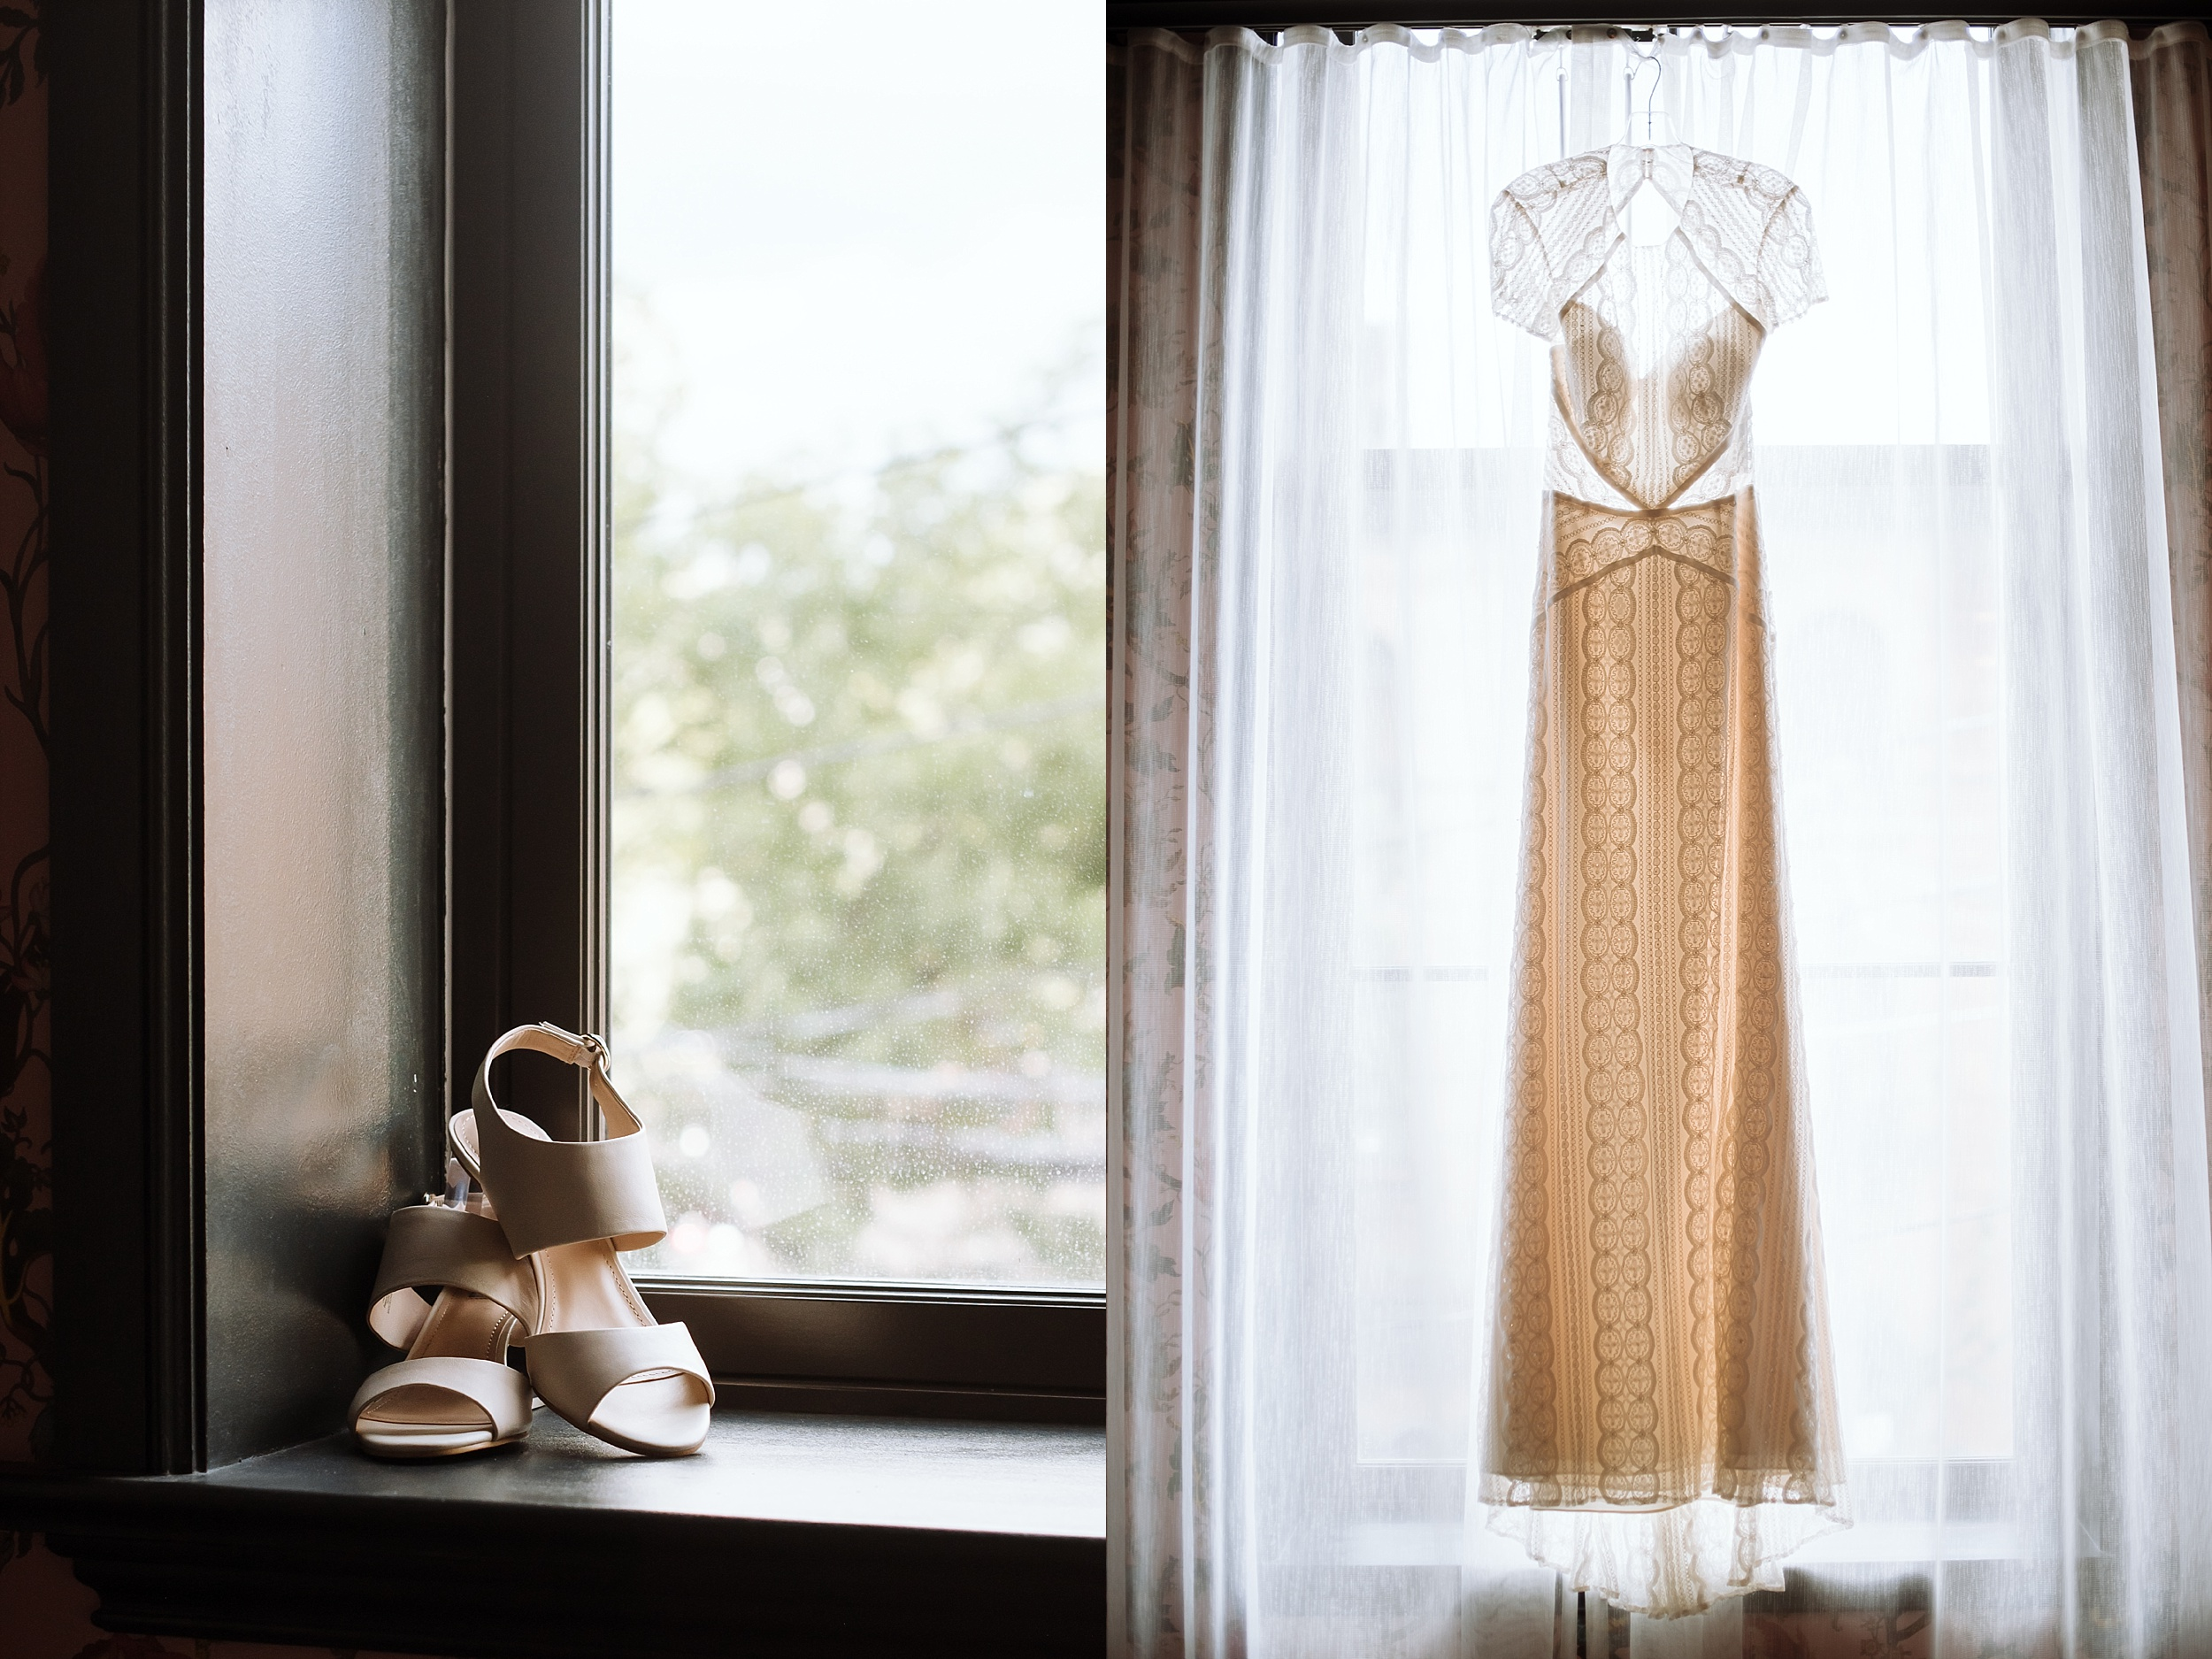 Broadview_Hotel_Wedding_Toronto_Photographer_0004.jpg